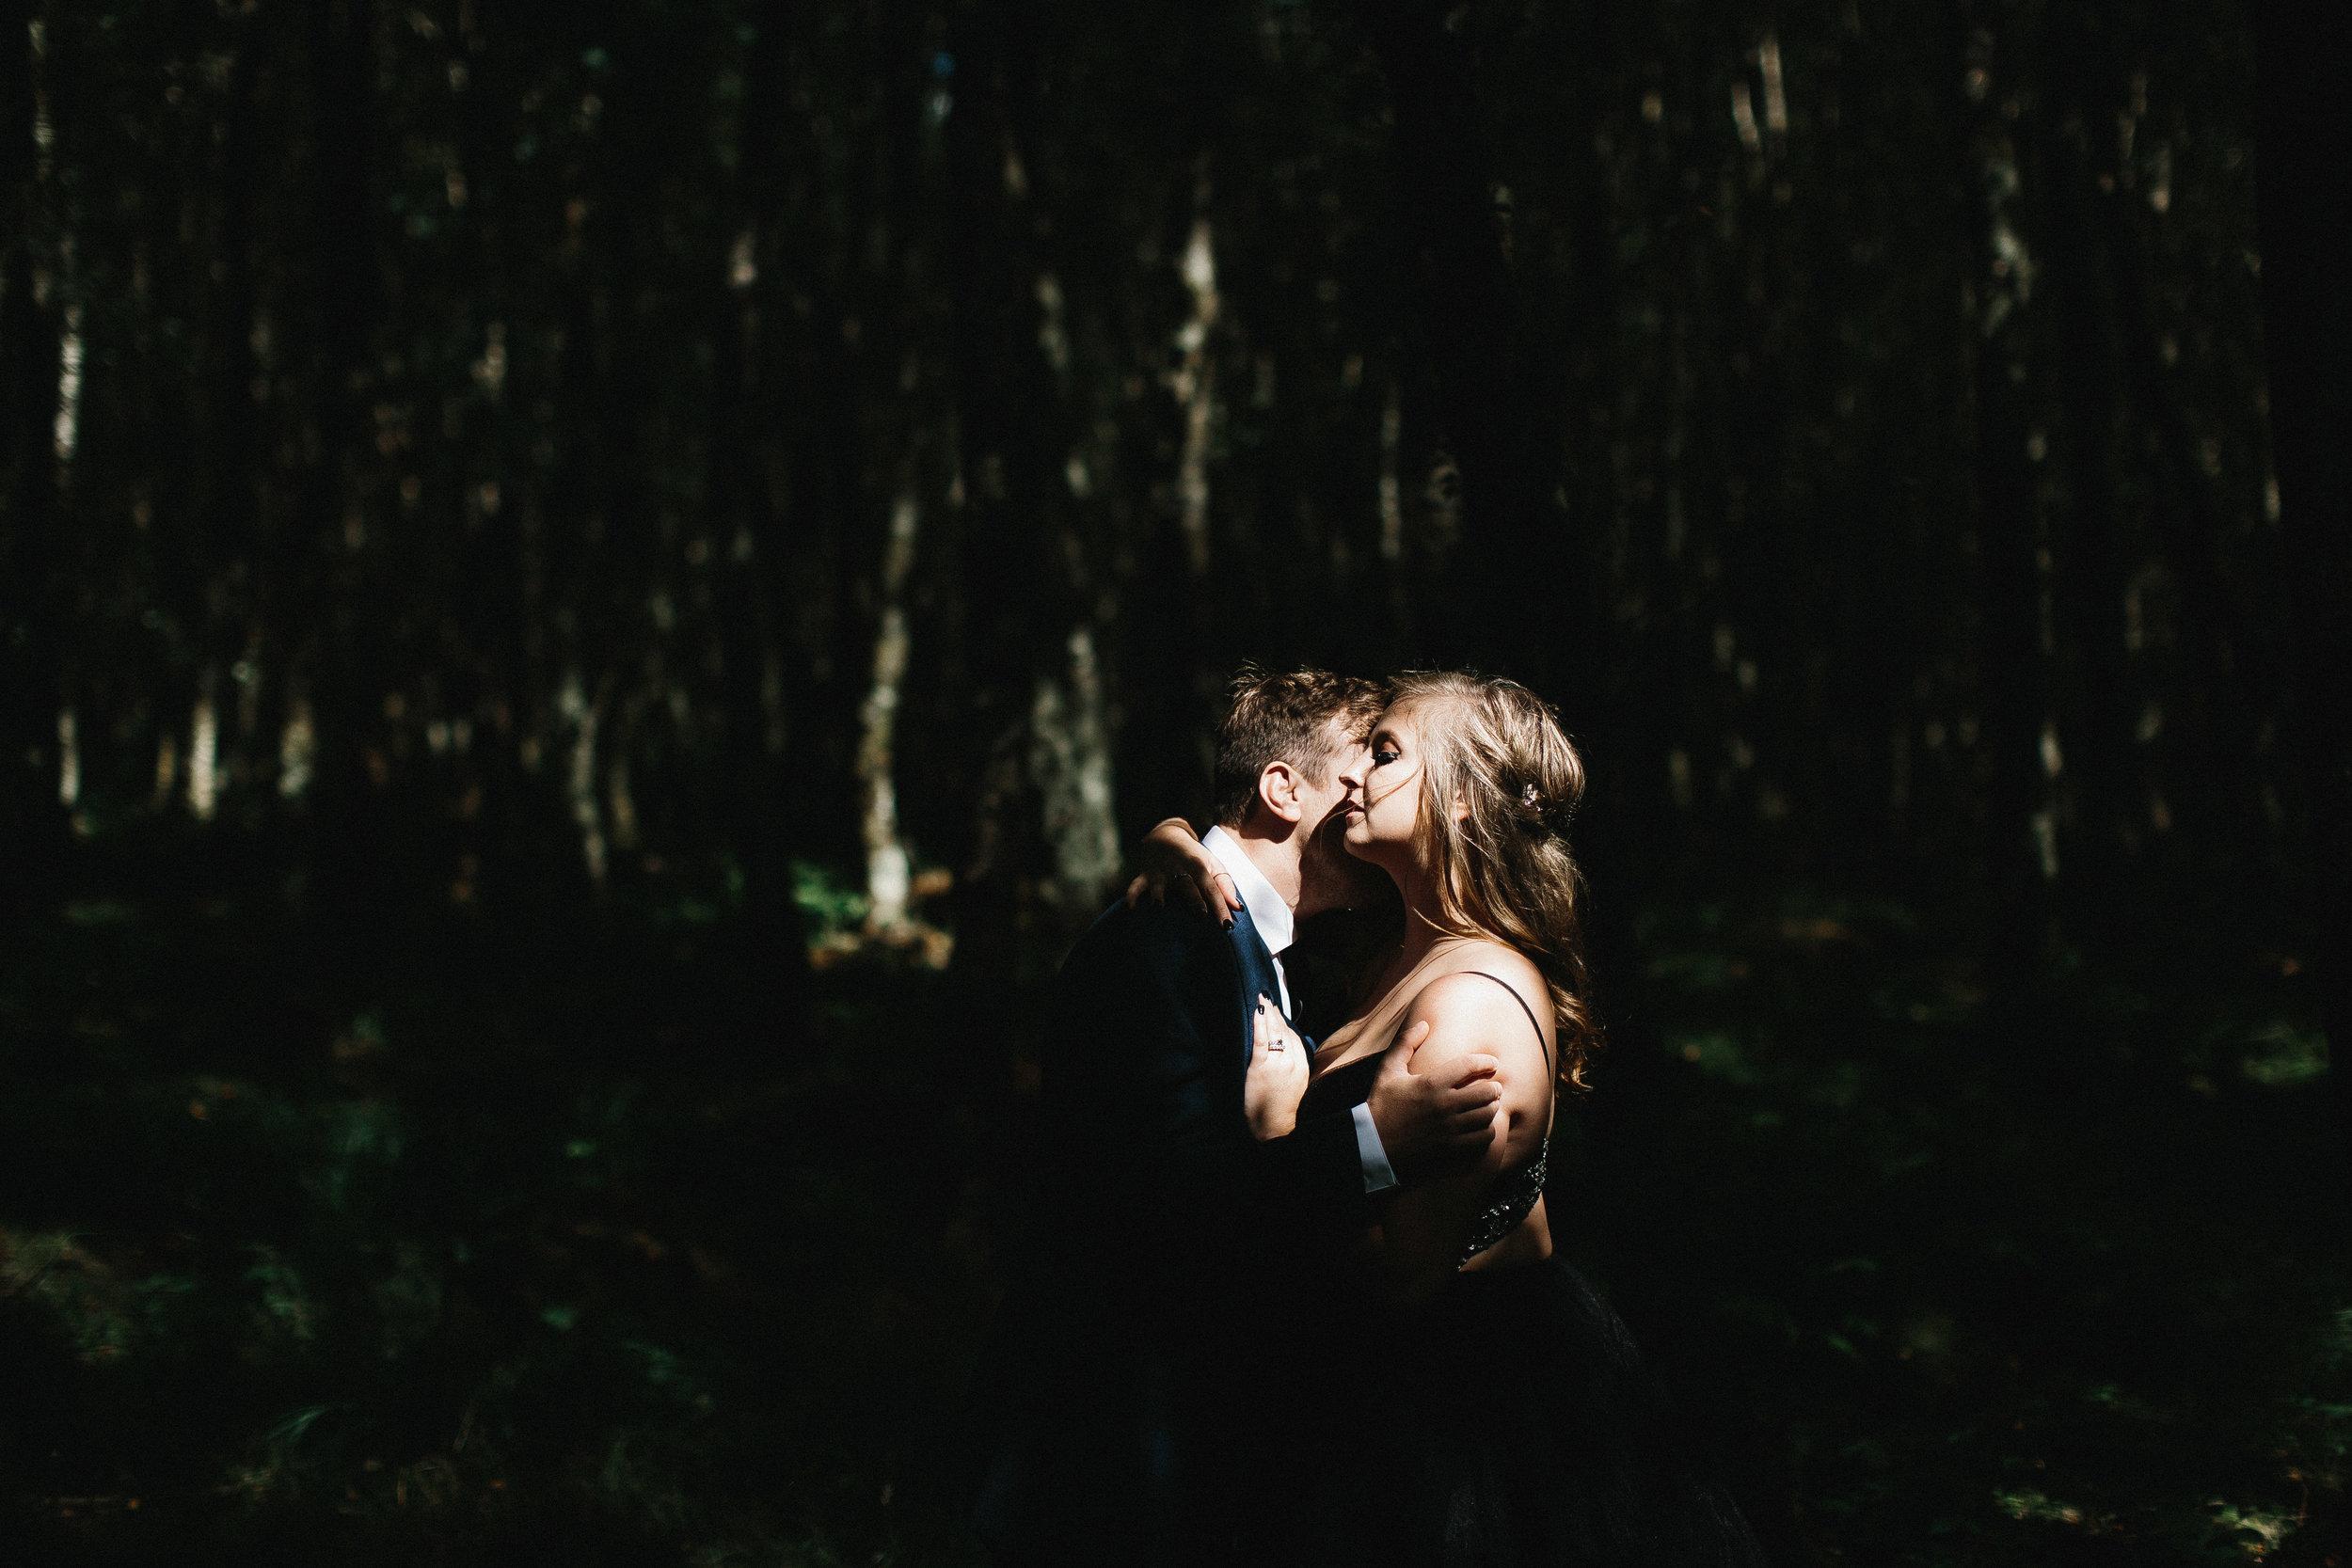 ireland_elopement_black_wedding_dress_wicklow_glendalough_athy_st_kevins_way_1542.jpg